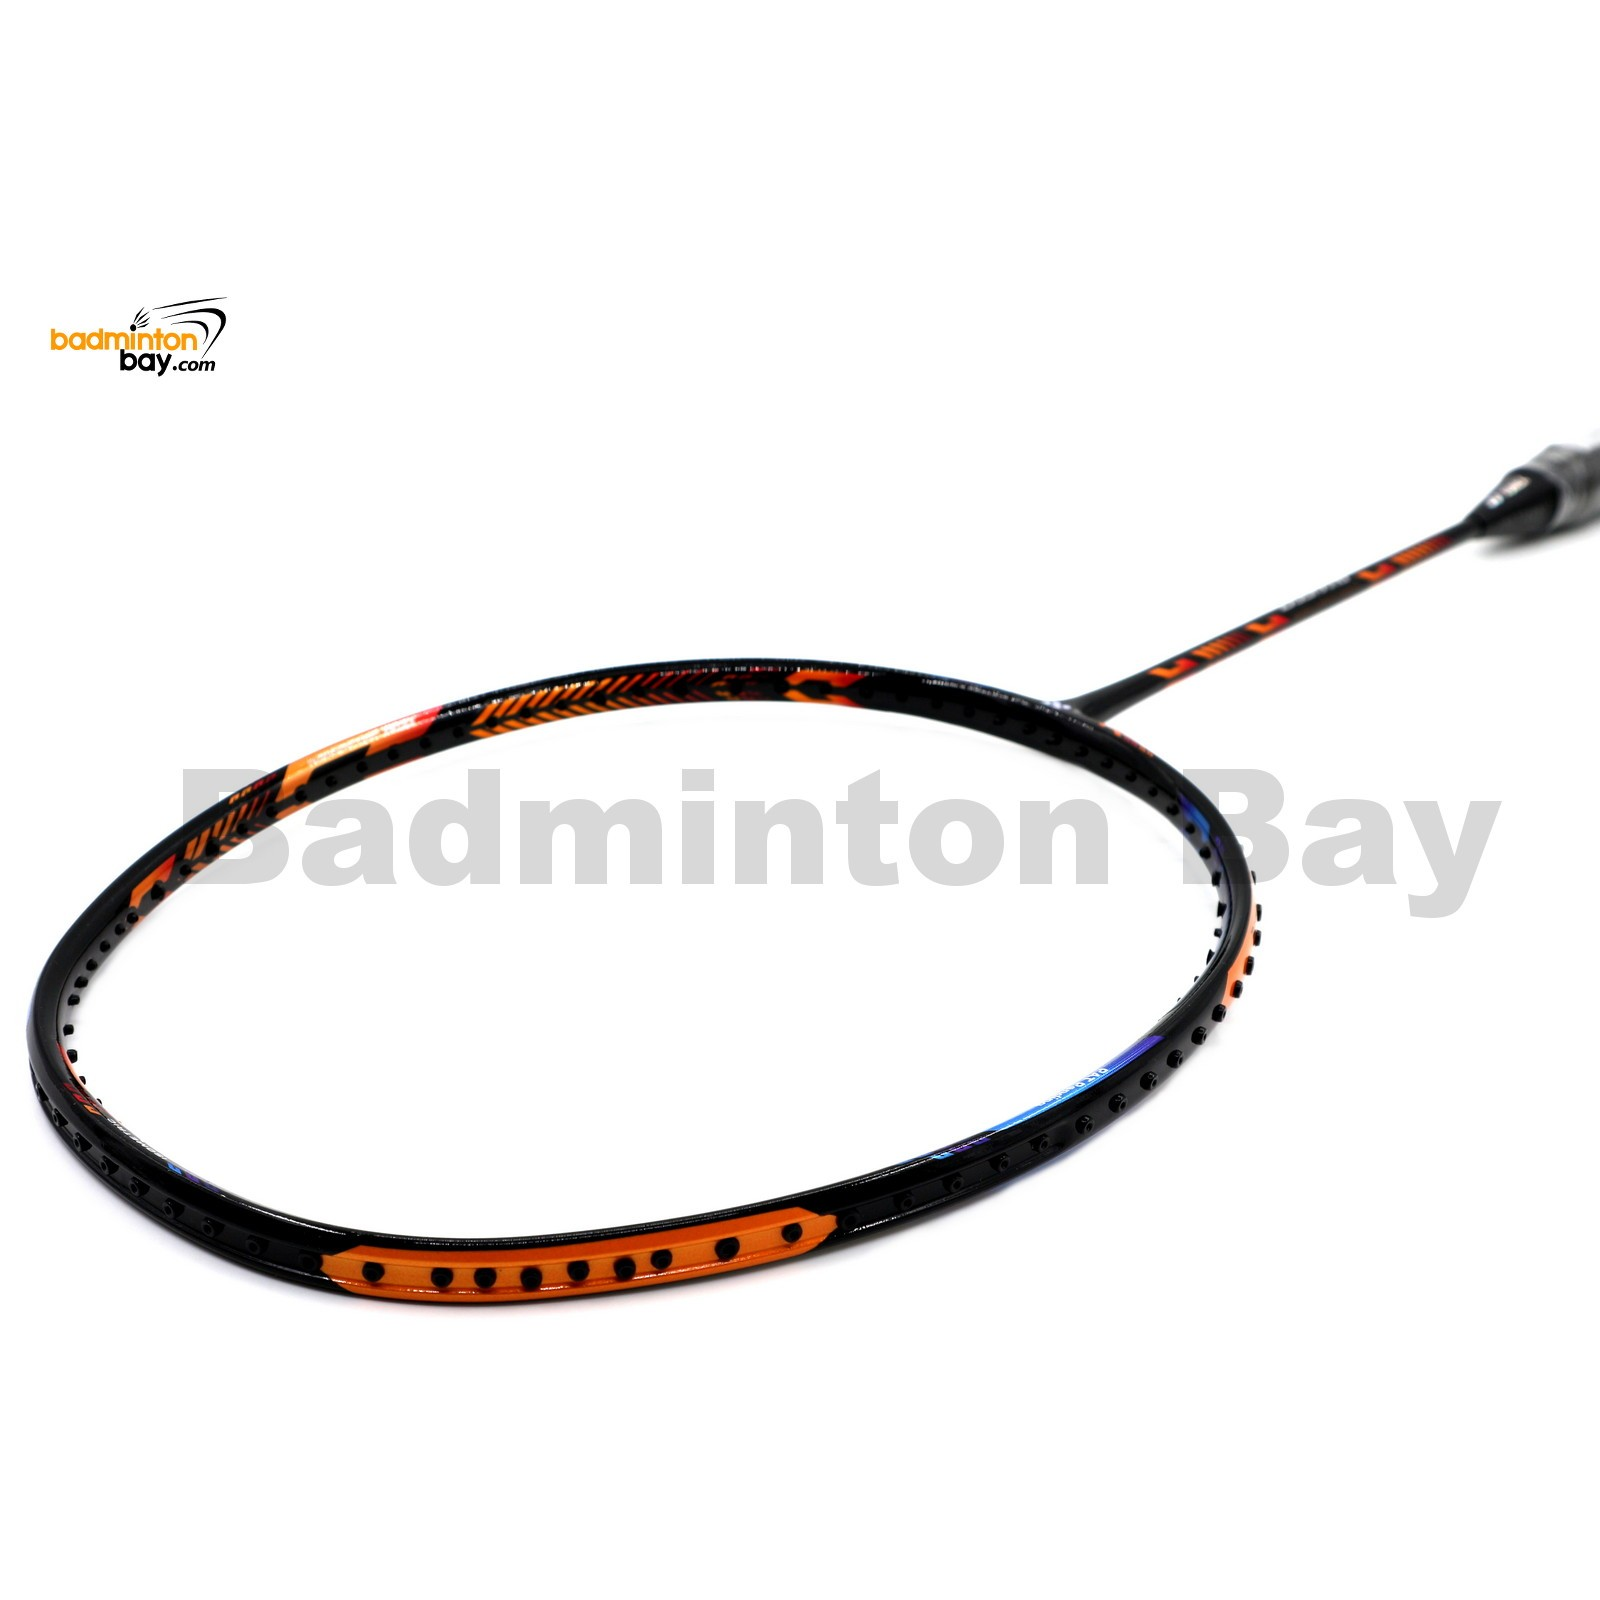 Tennis & Racquet Sports New Yonex Duora 10 Lee Chong Wei Badminton Racket 3u G5 Blue Orange At Any Cost